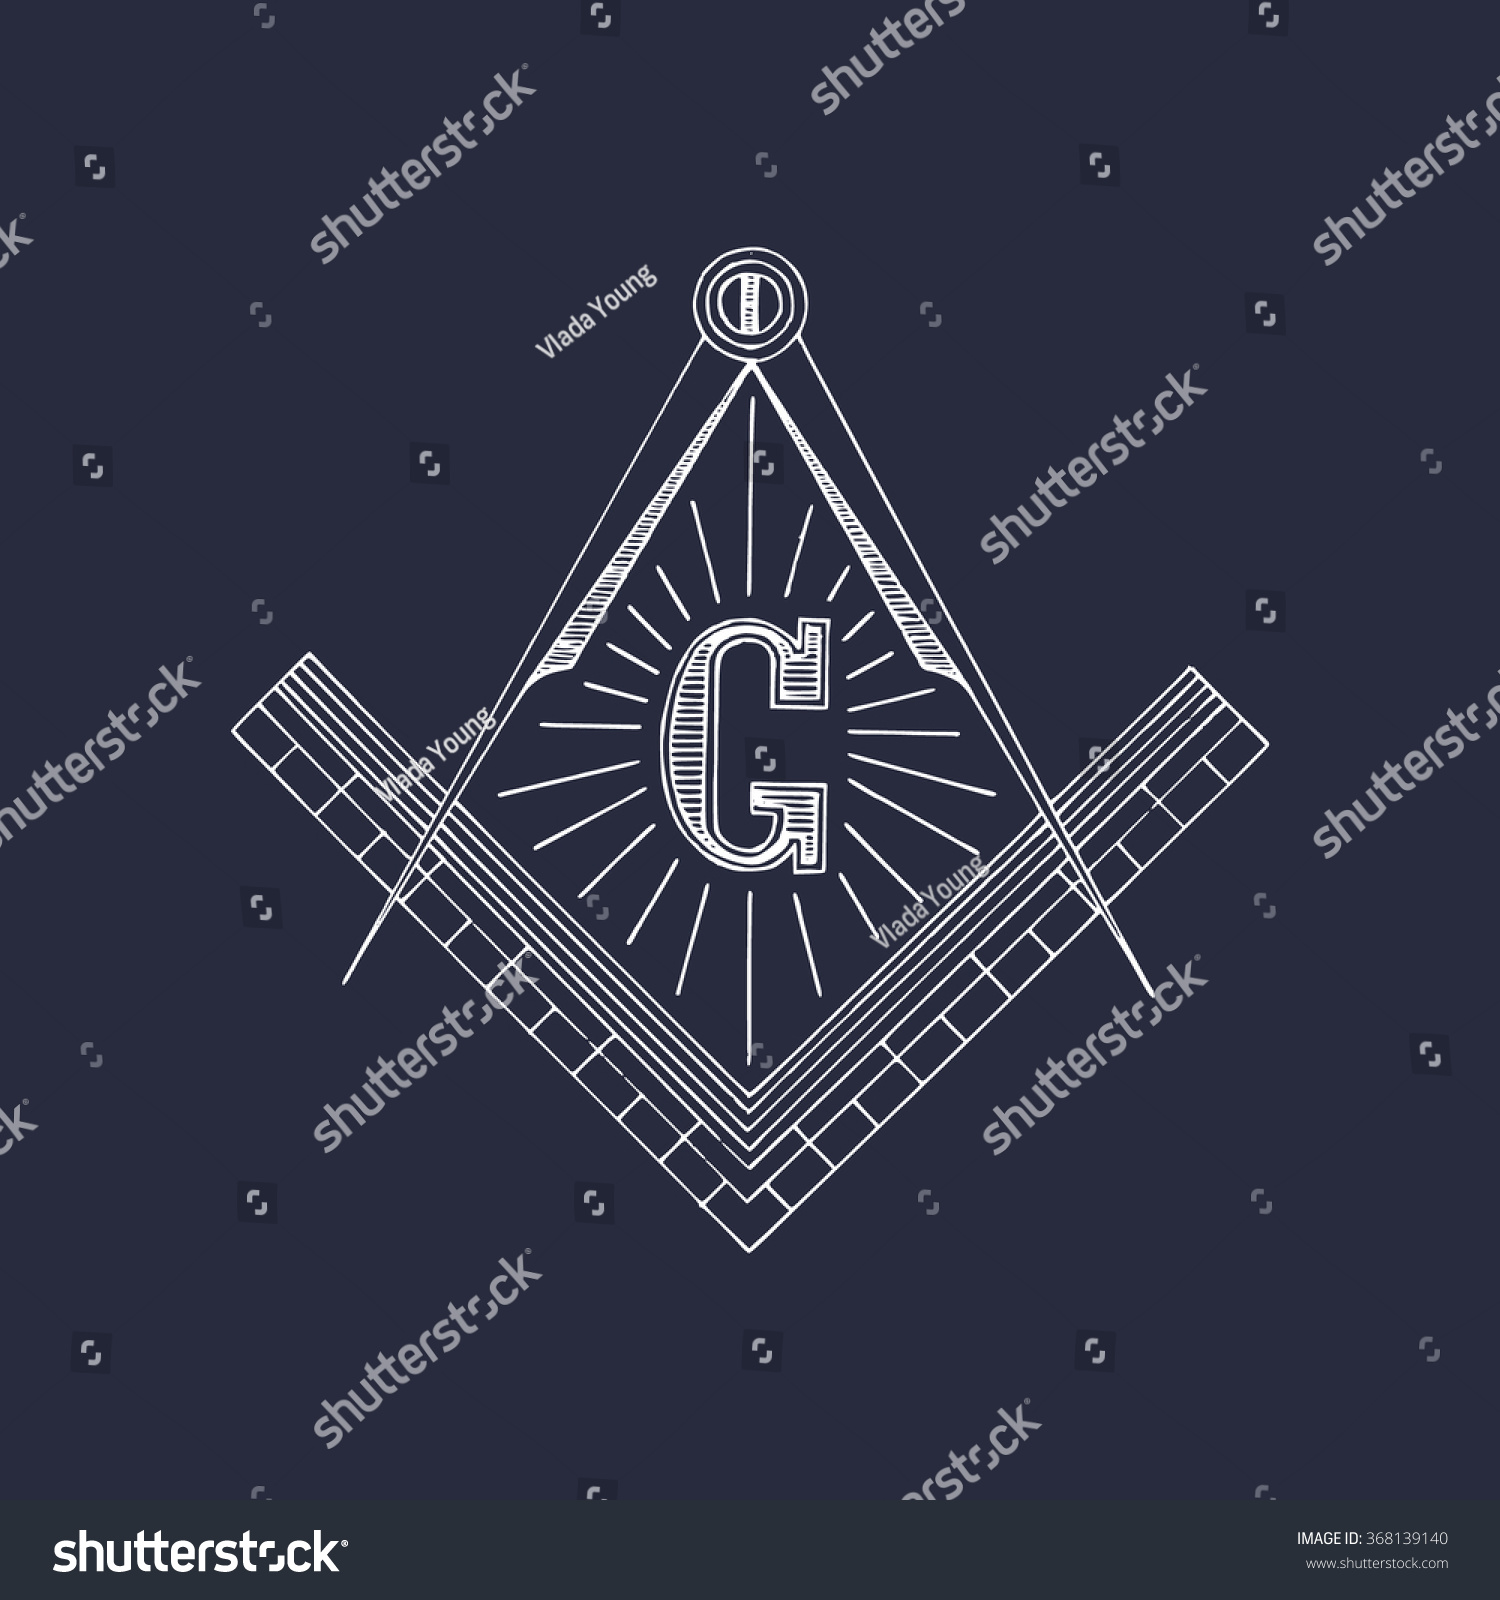 Masonic Square Compass Symbols Hand Drawn Stock Vector